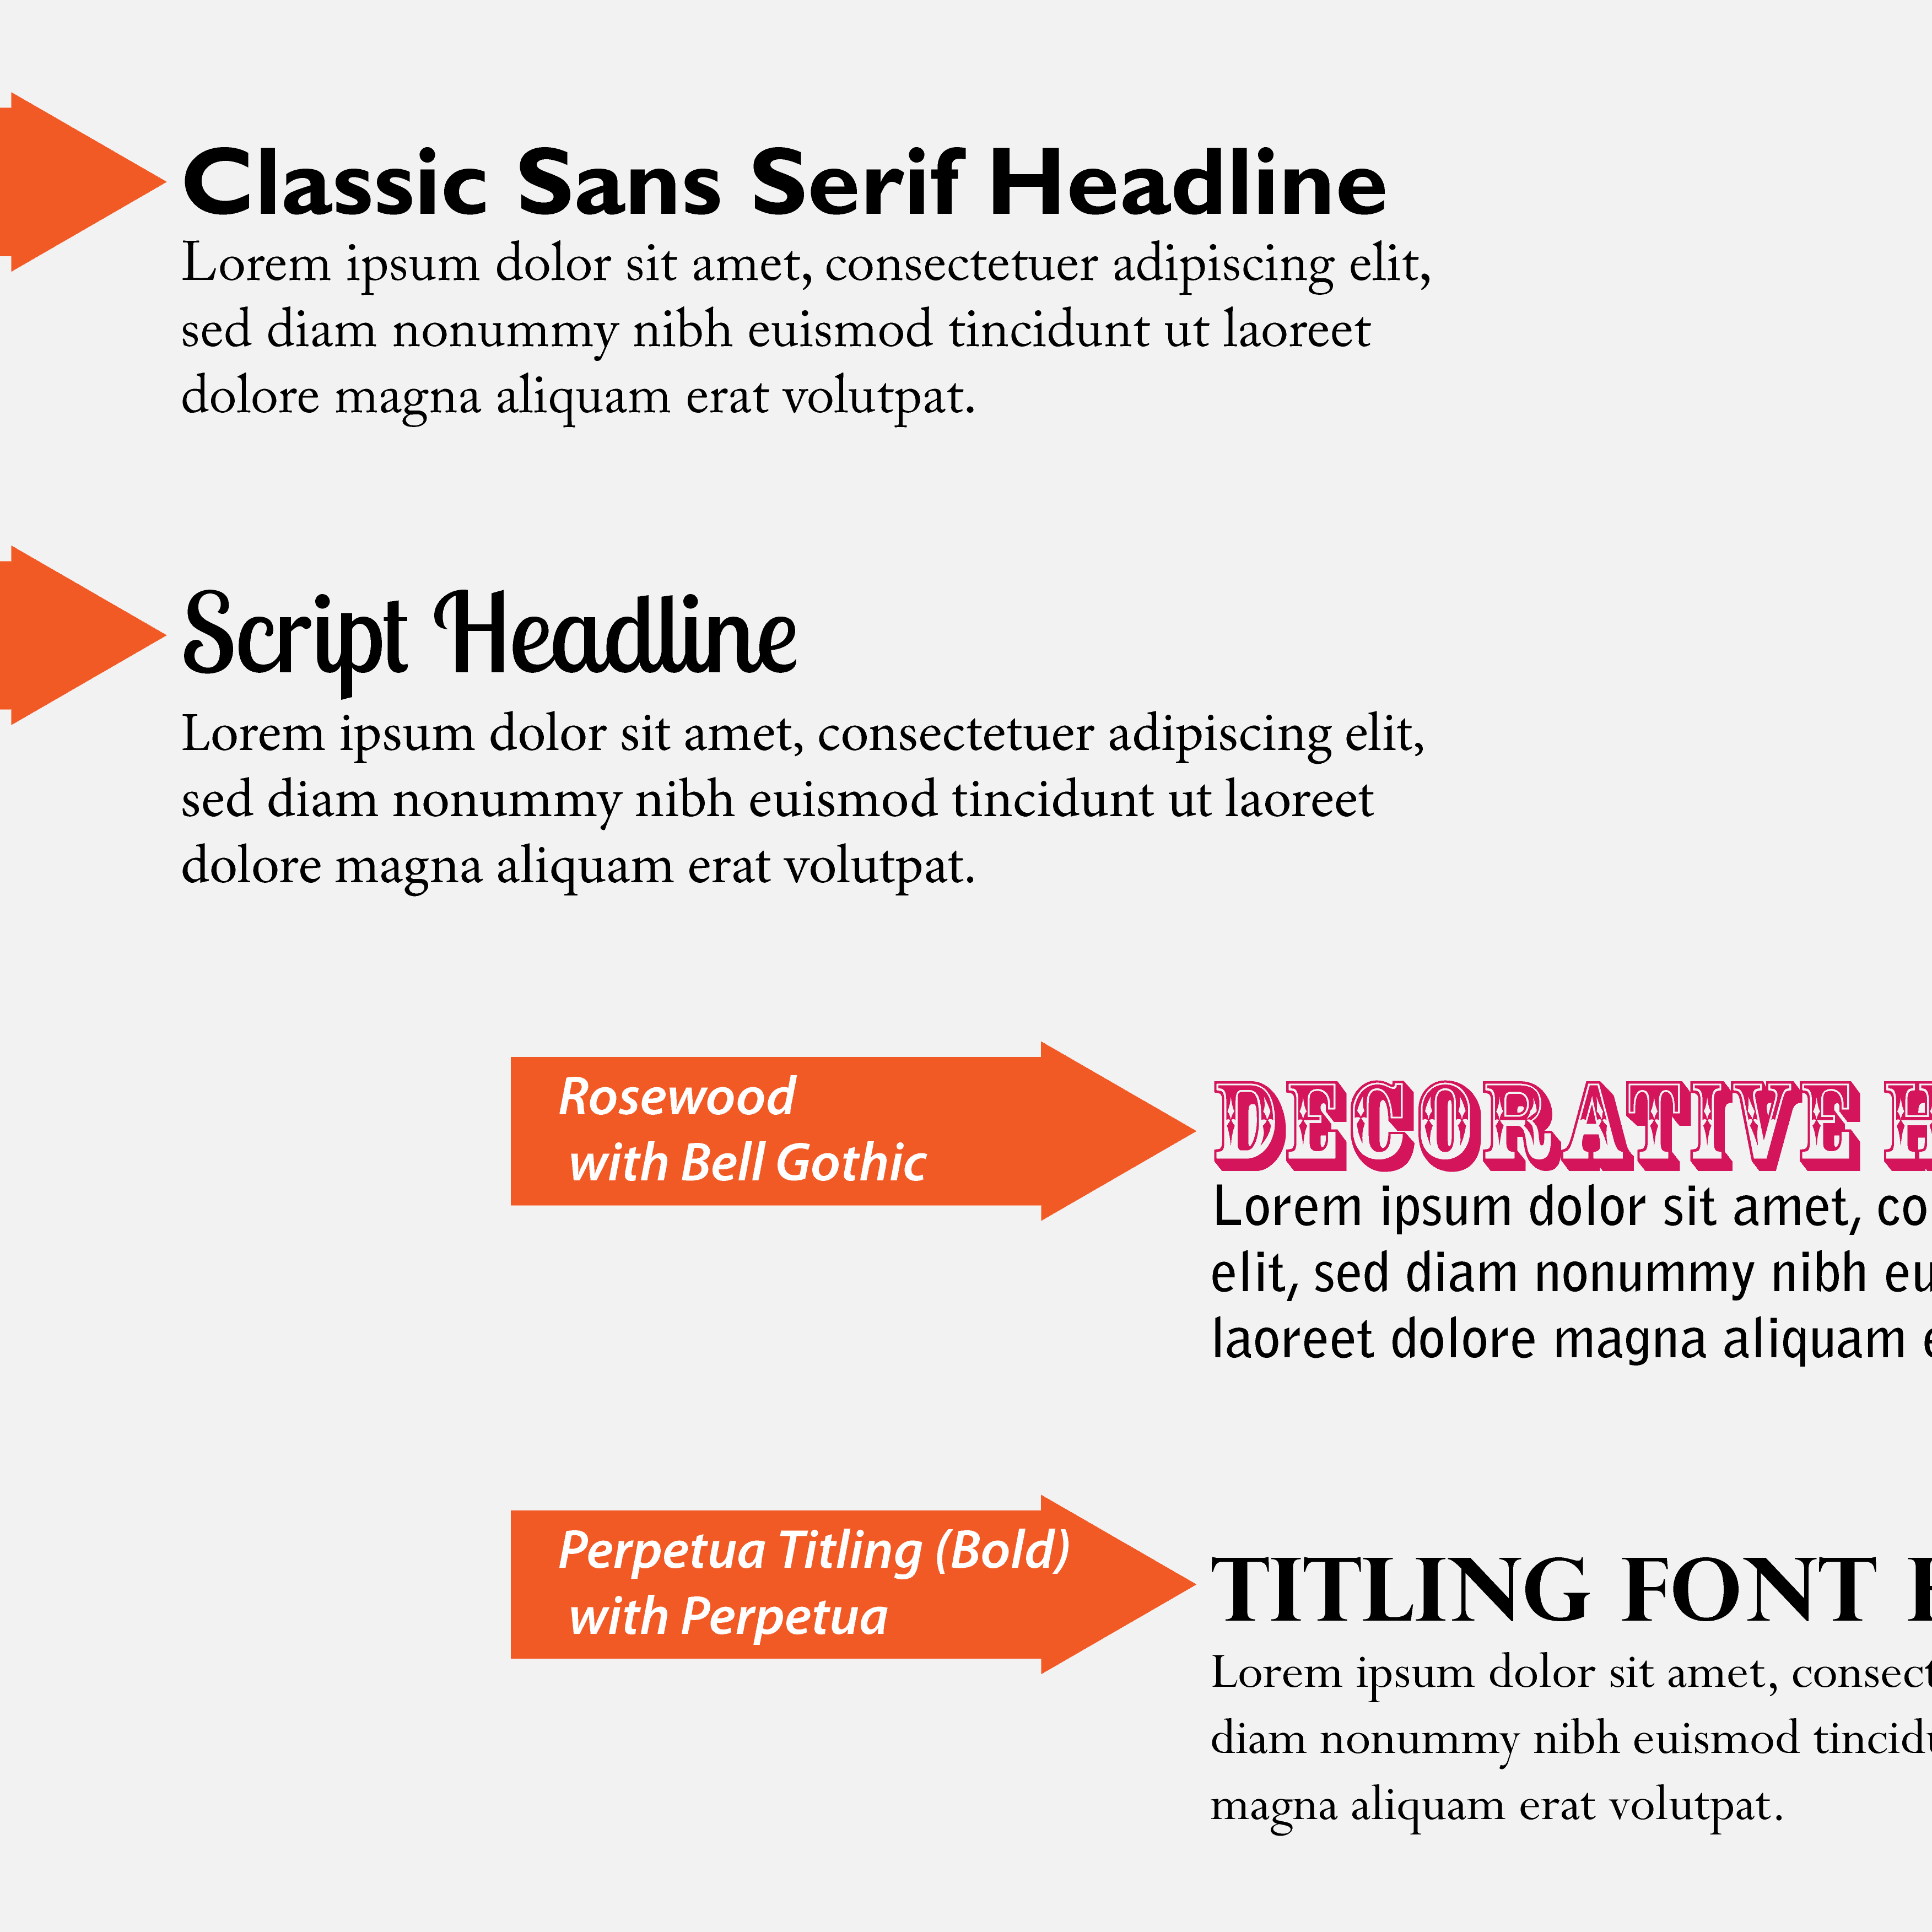 Choosing the best headline fonts